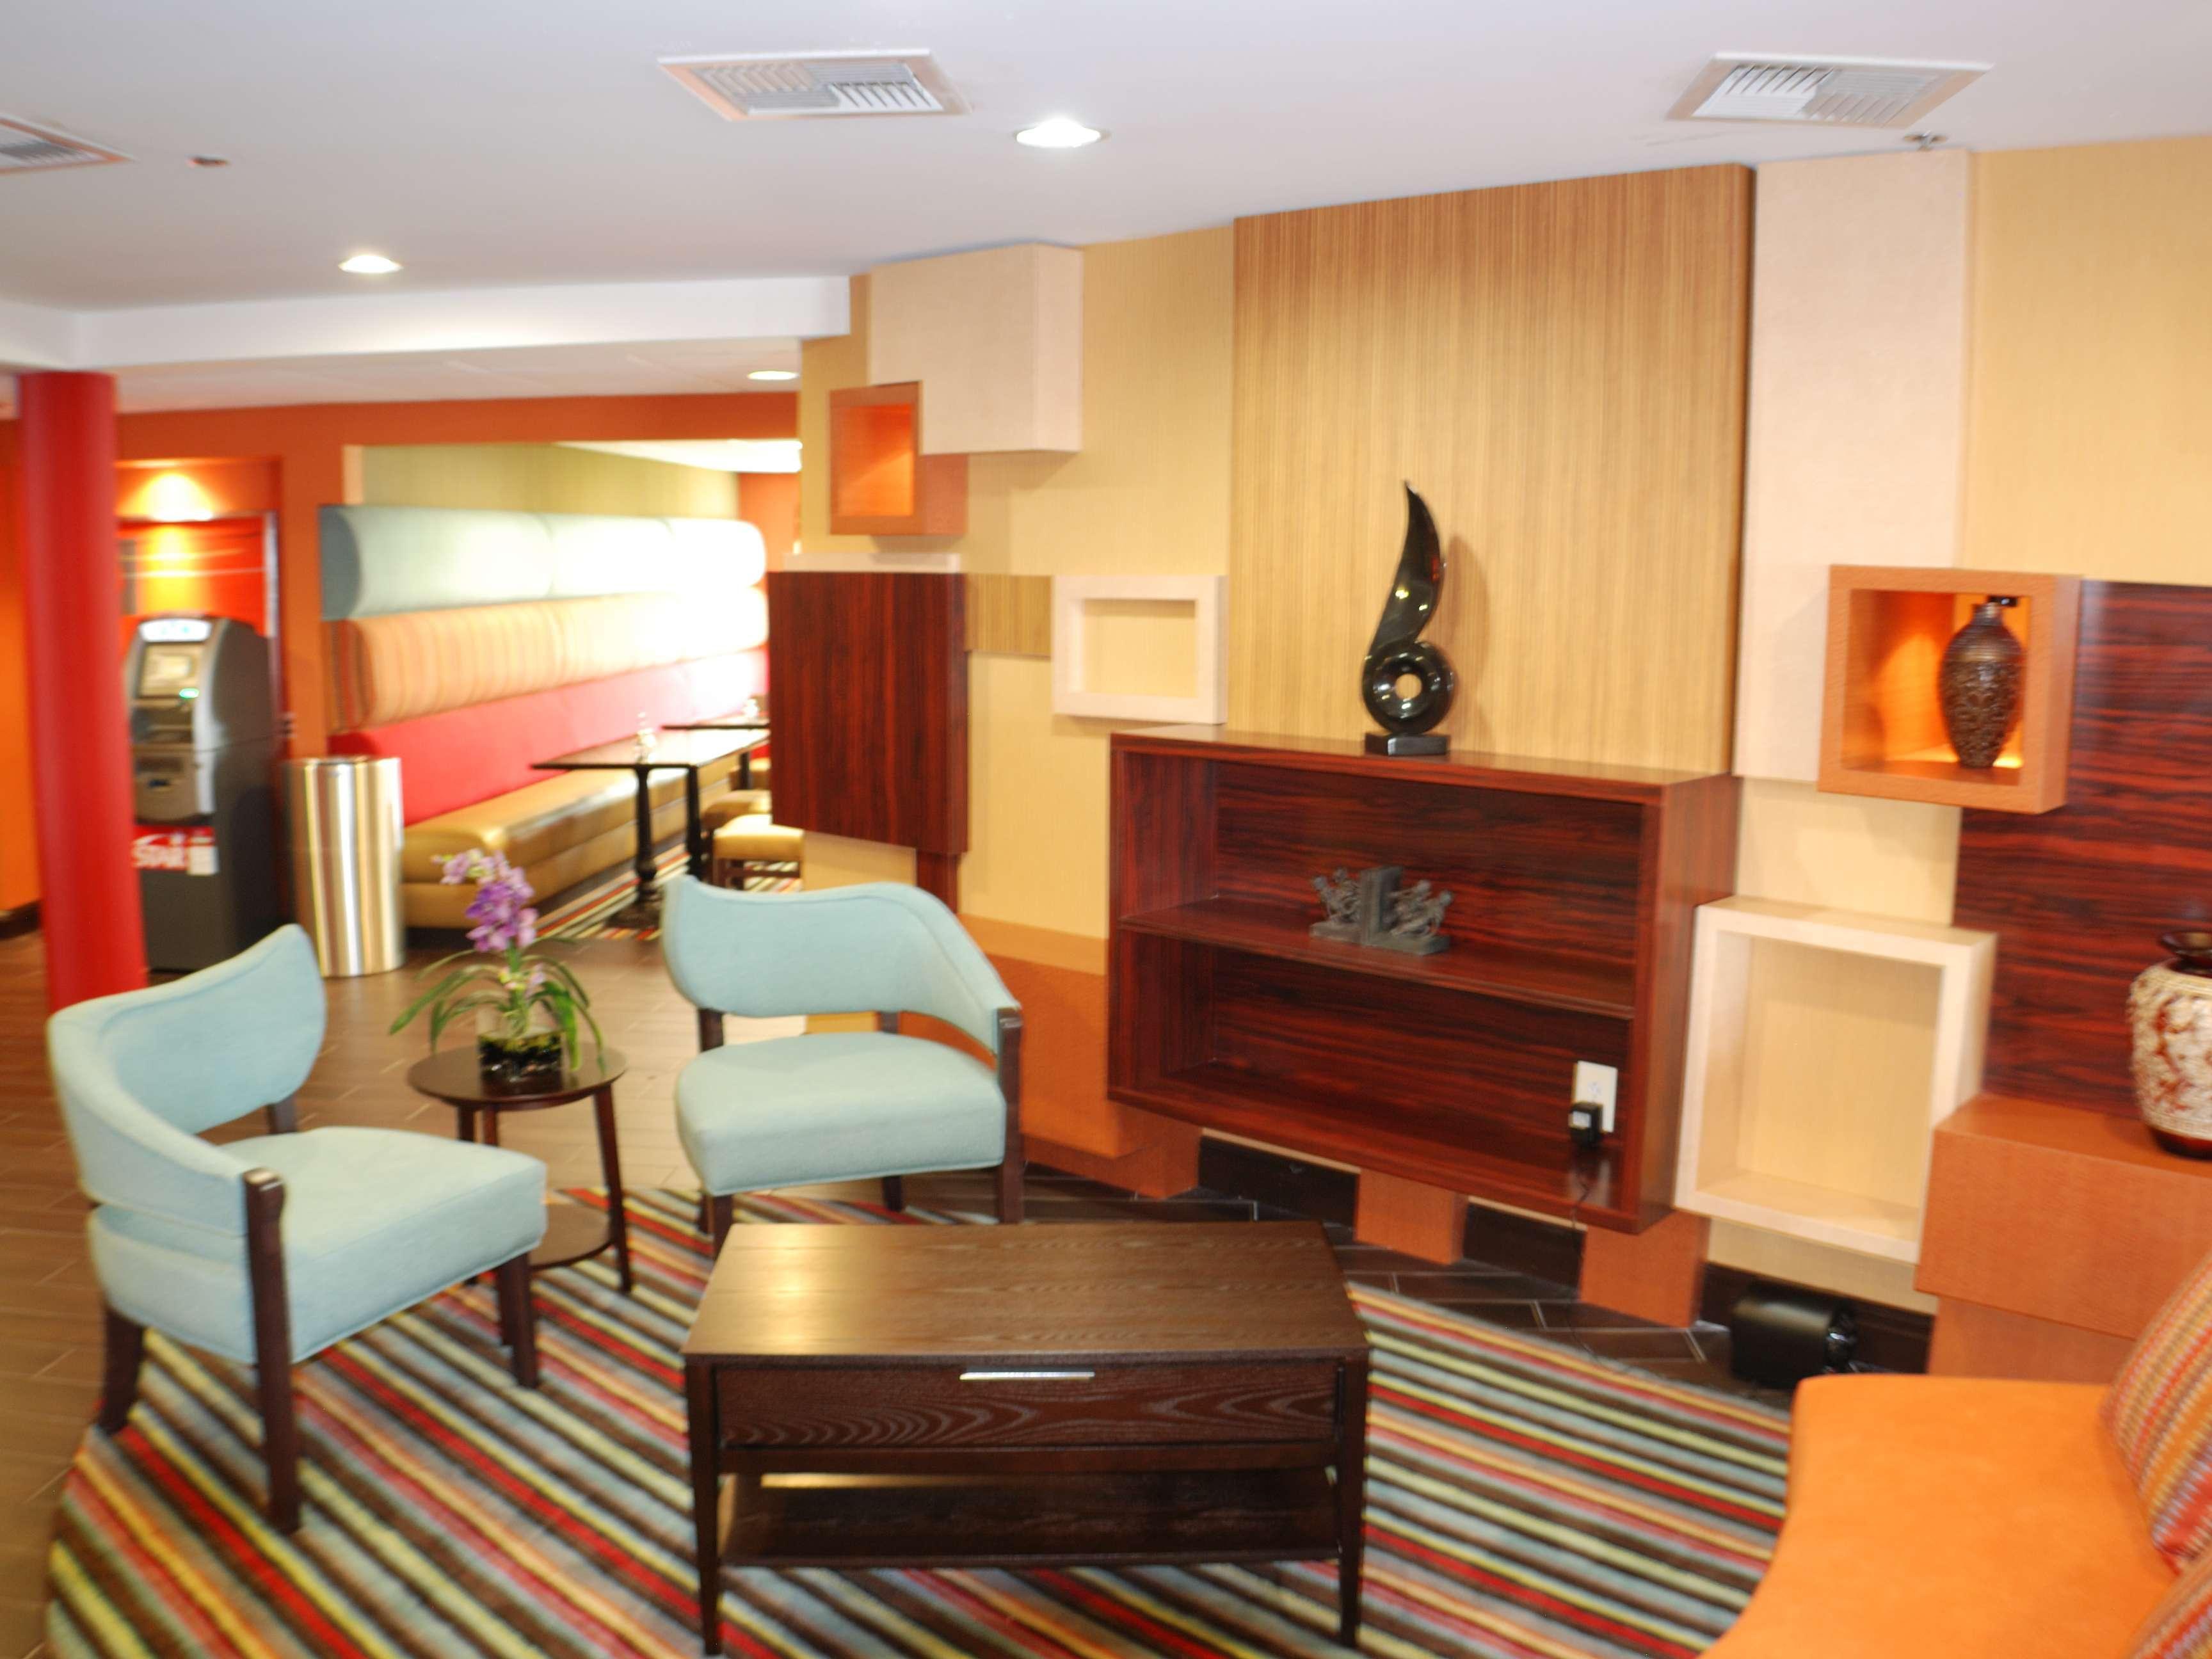 Holiday inn express nashville w i40 whitebridge rd hotel - Hotel suites nashville tn 2 bedroom ...